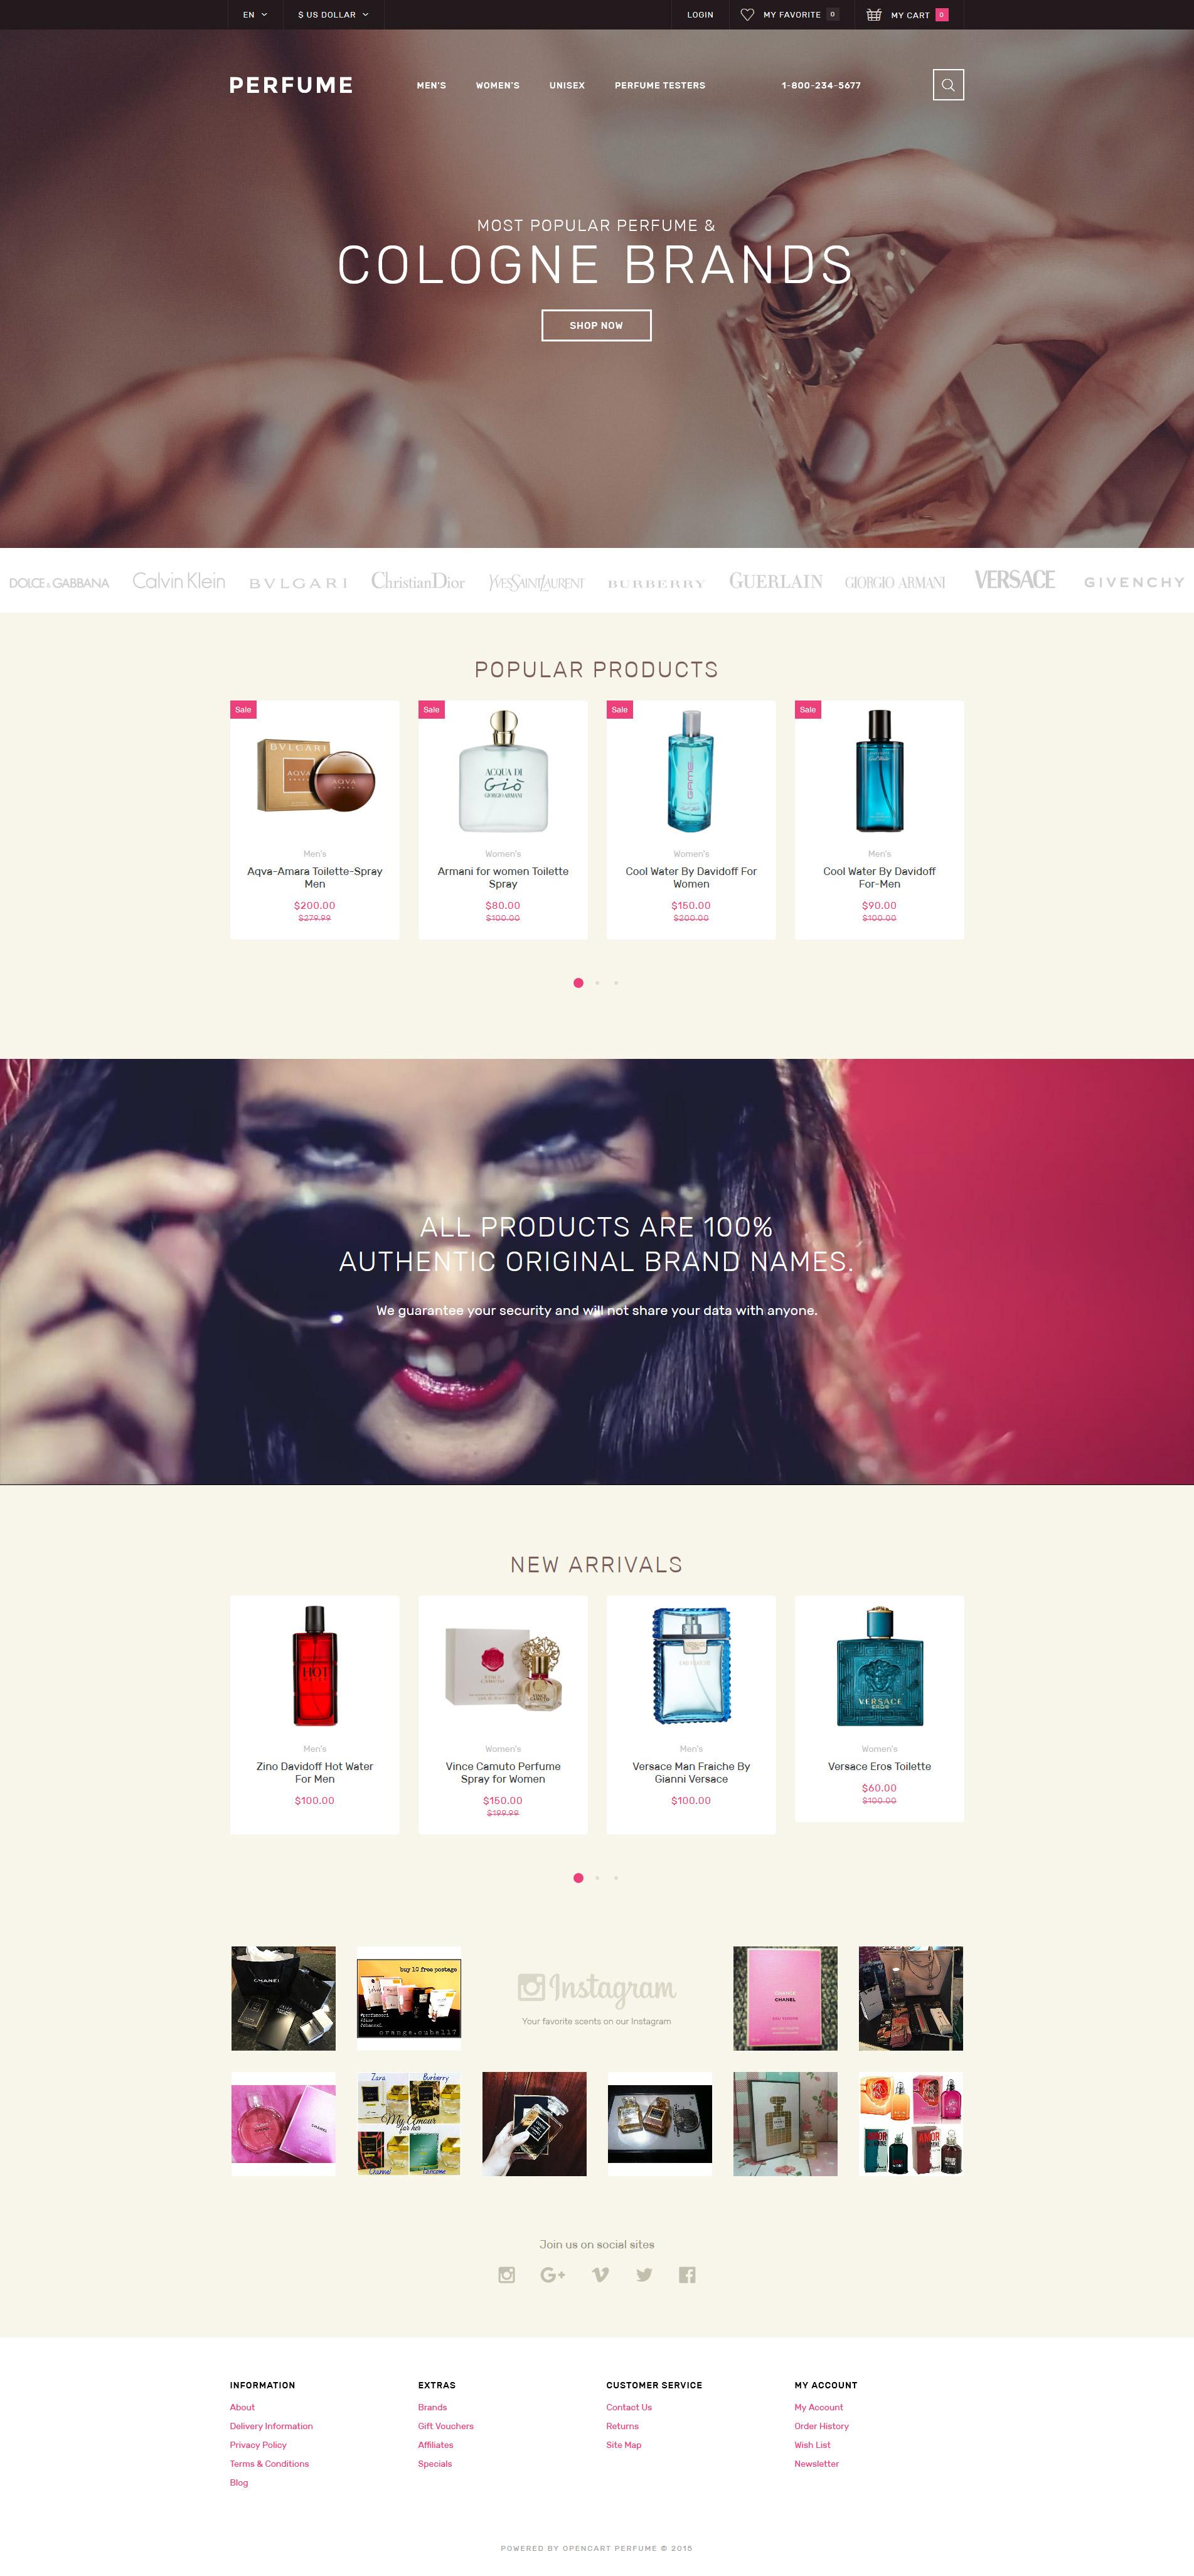 Perfume Shop №58164 - скриншот